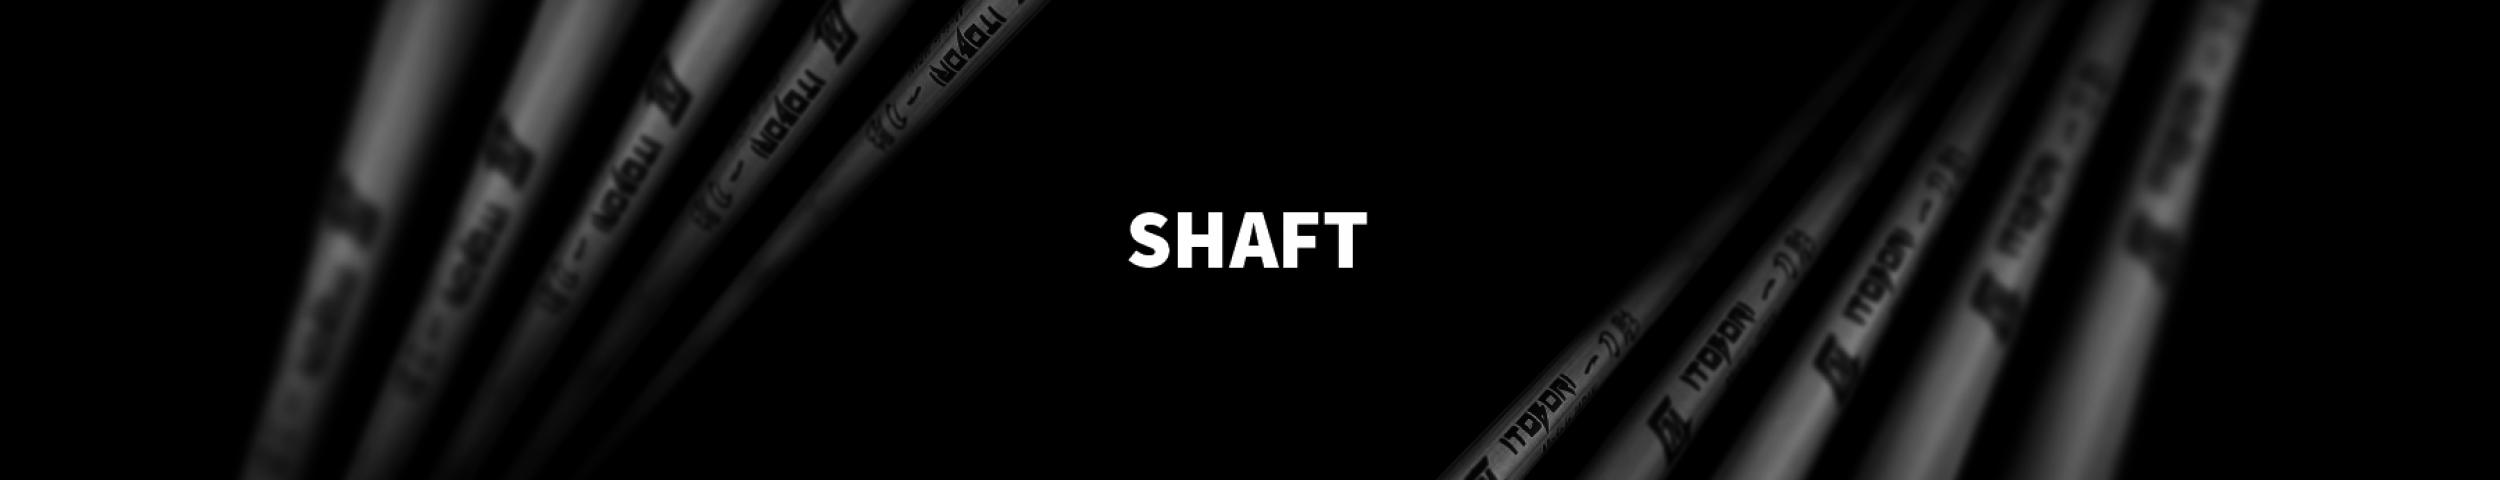 img_shaft